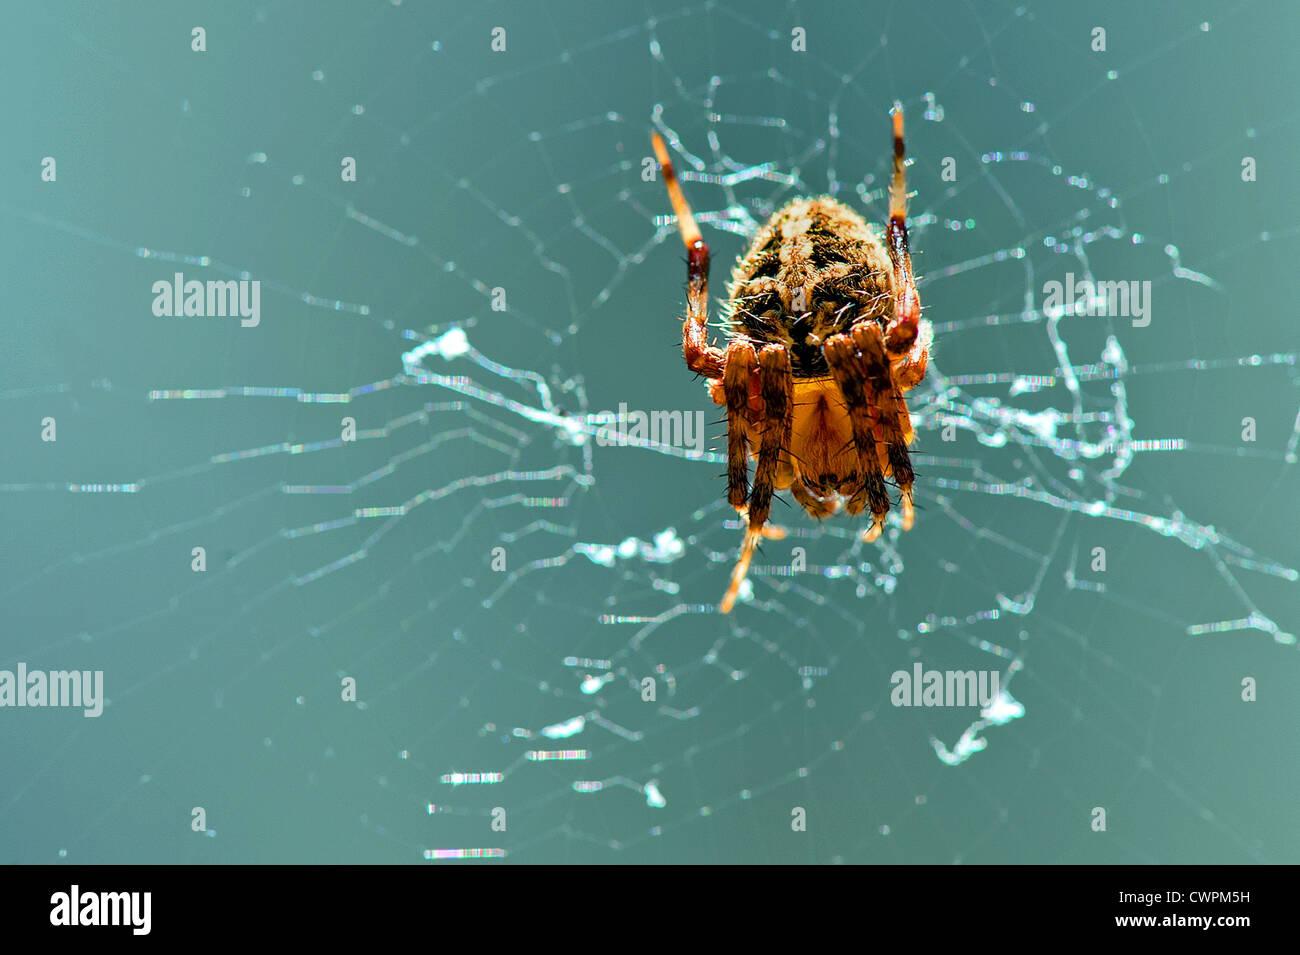 Giardino europeo spider Immagini Stock